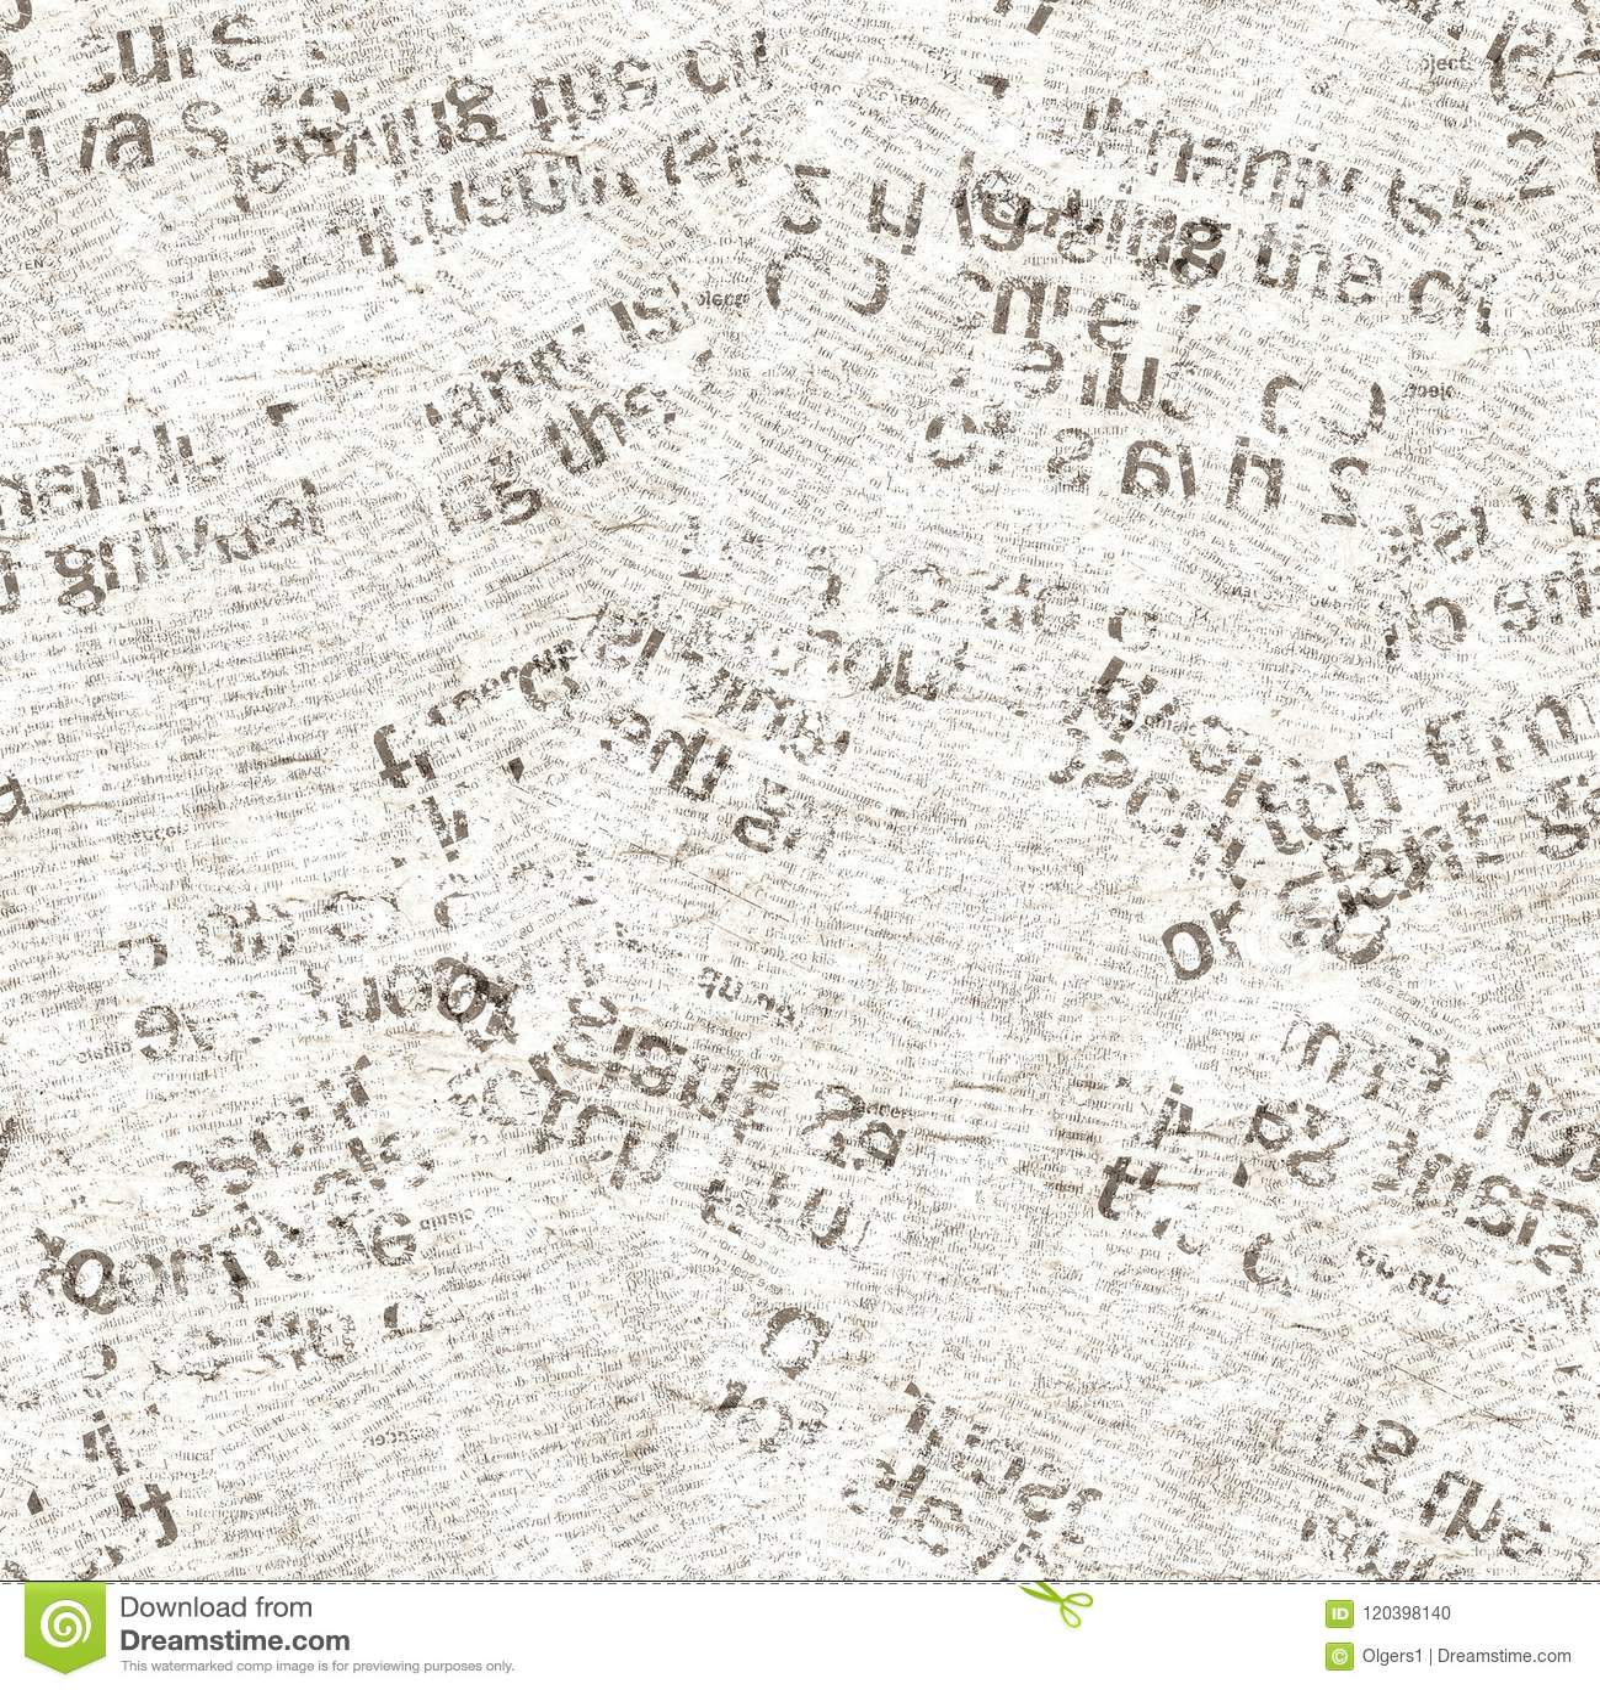 Newspaper Vintage Grunge Collage Seamless Texture Stock Photo